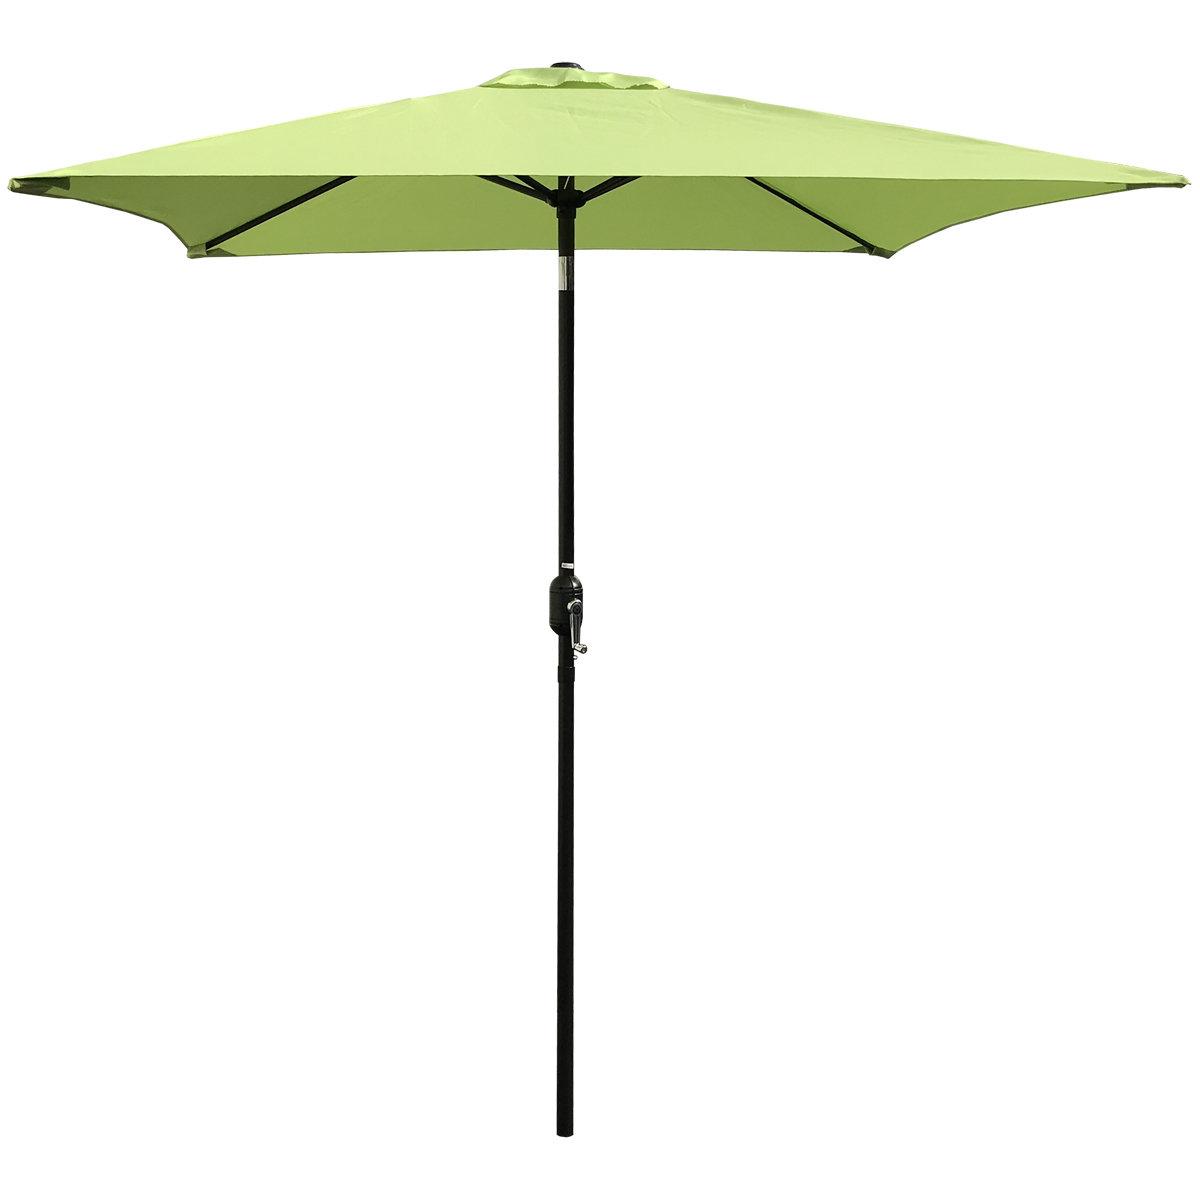 Bradford Patio Market Umbrellas With Regard To 2019 Bradford Patio  (View 10 of 20)